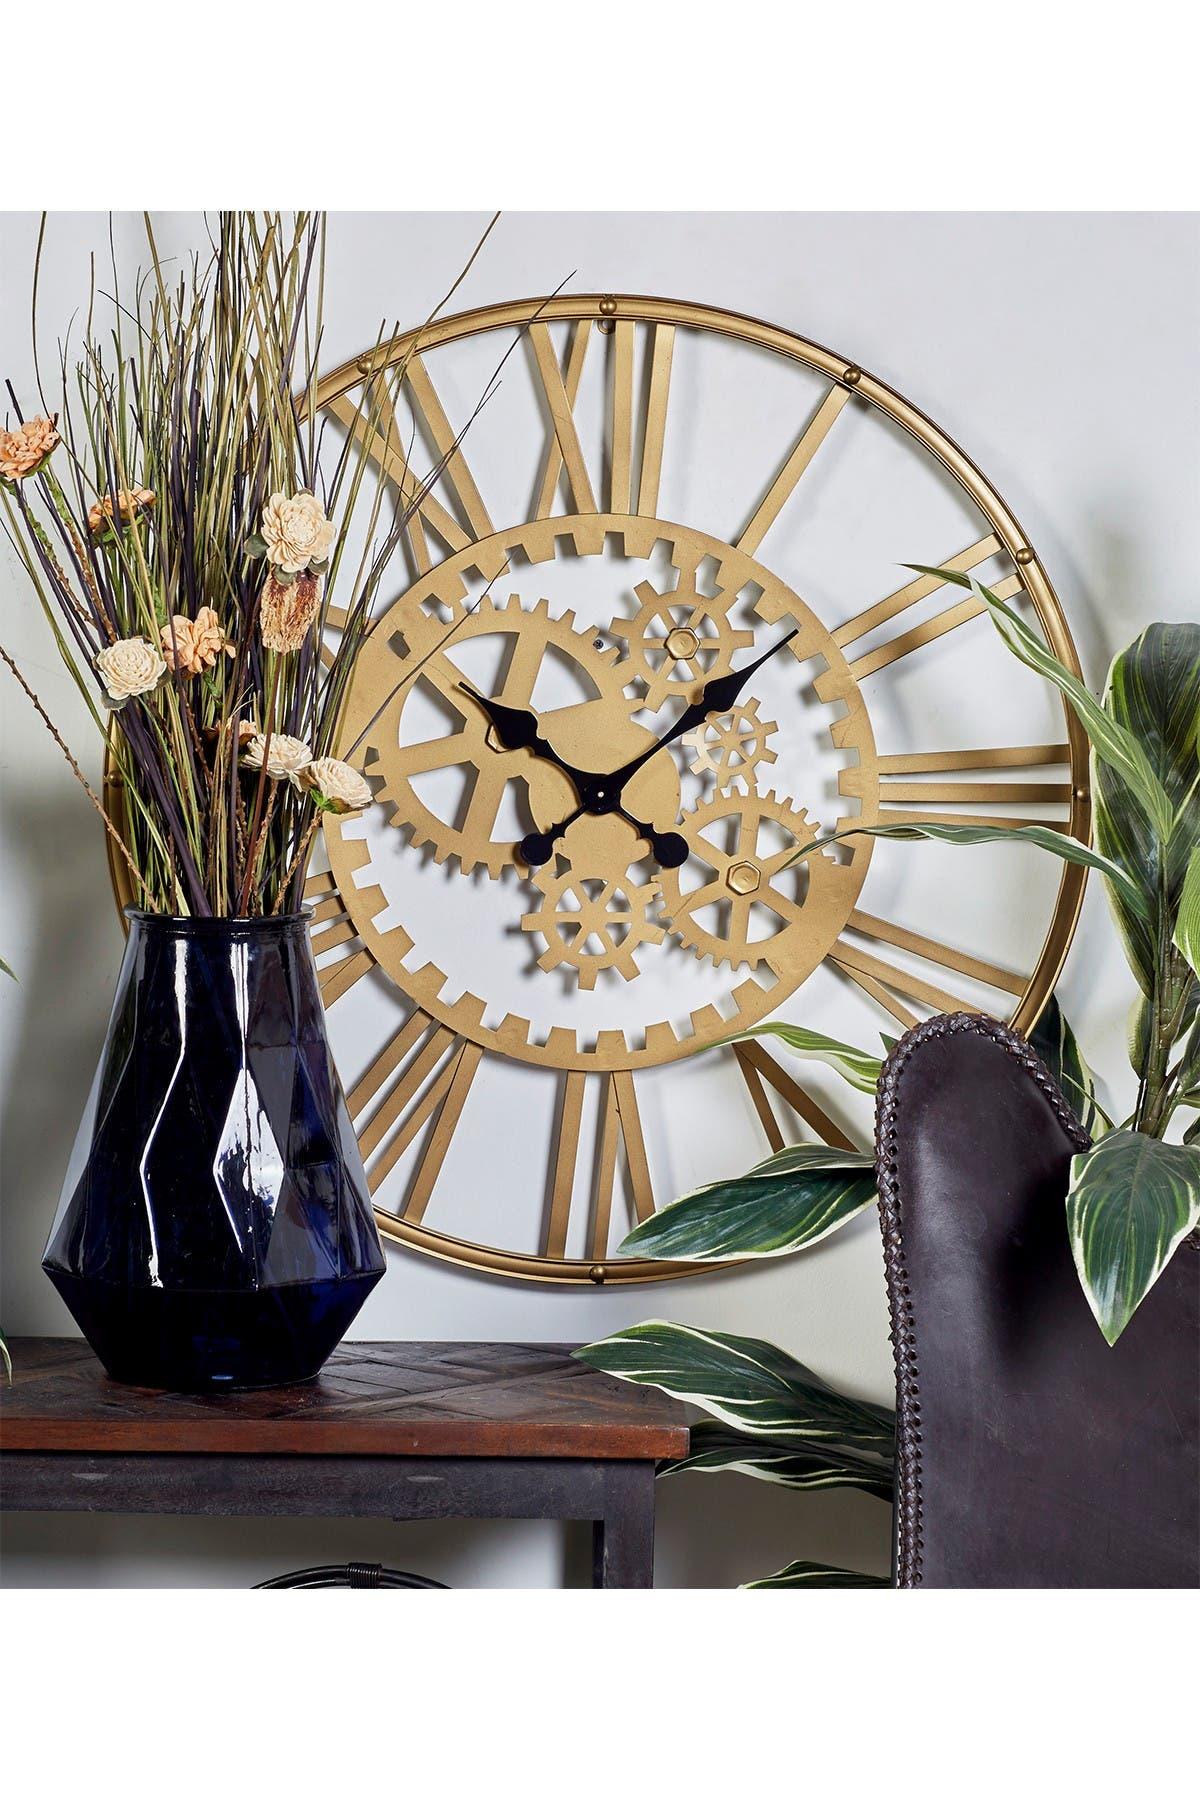 "Image of CosmoLiving by Cosmopolitan Metal Gear Wall Clock - 32"" Diameter"